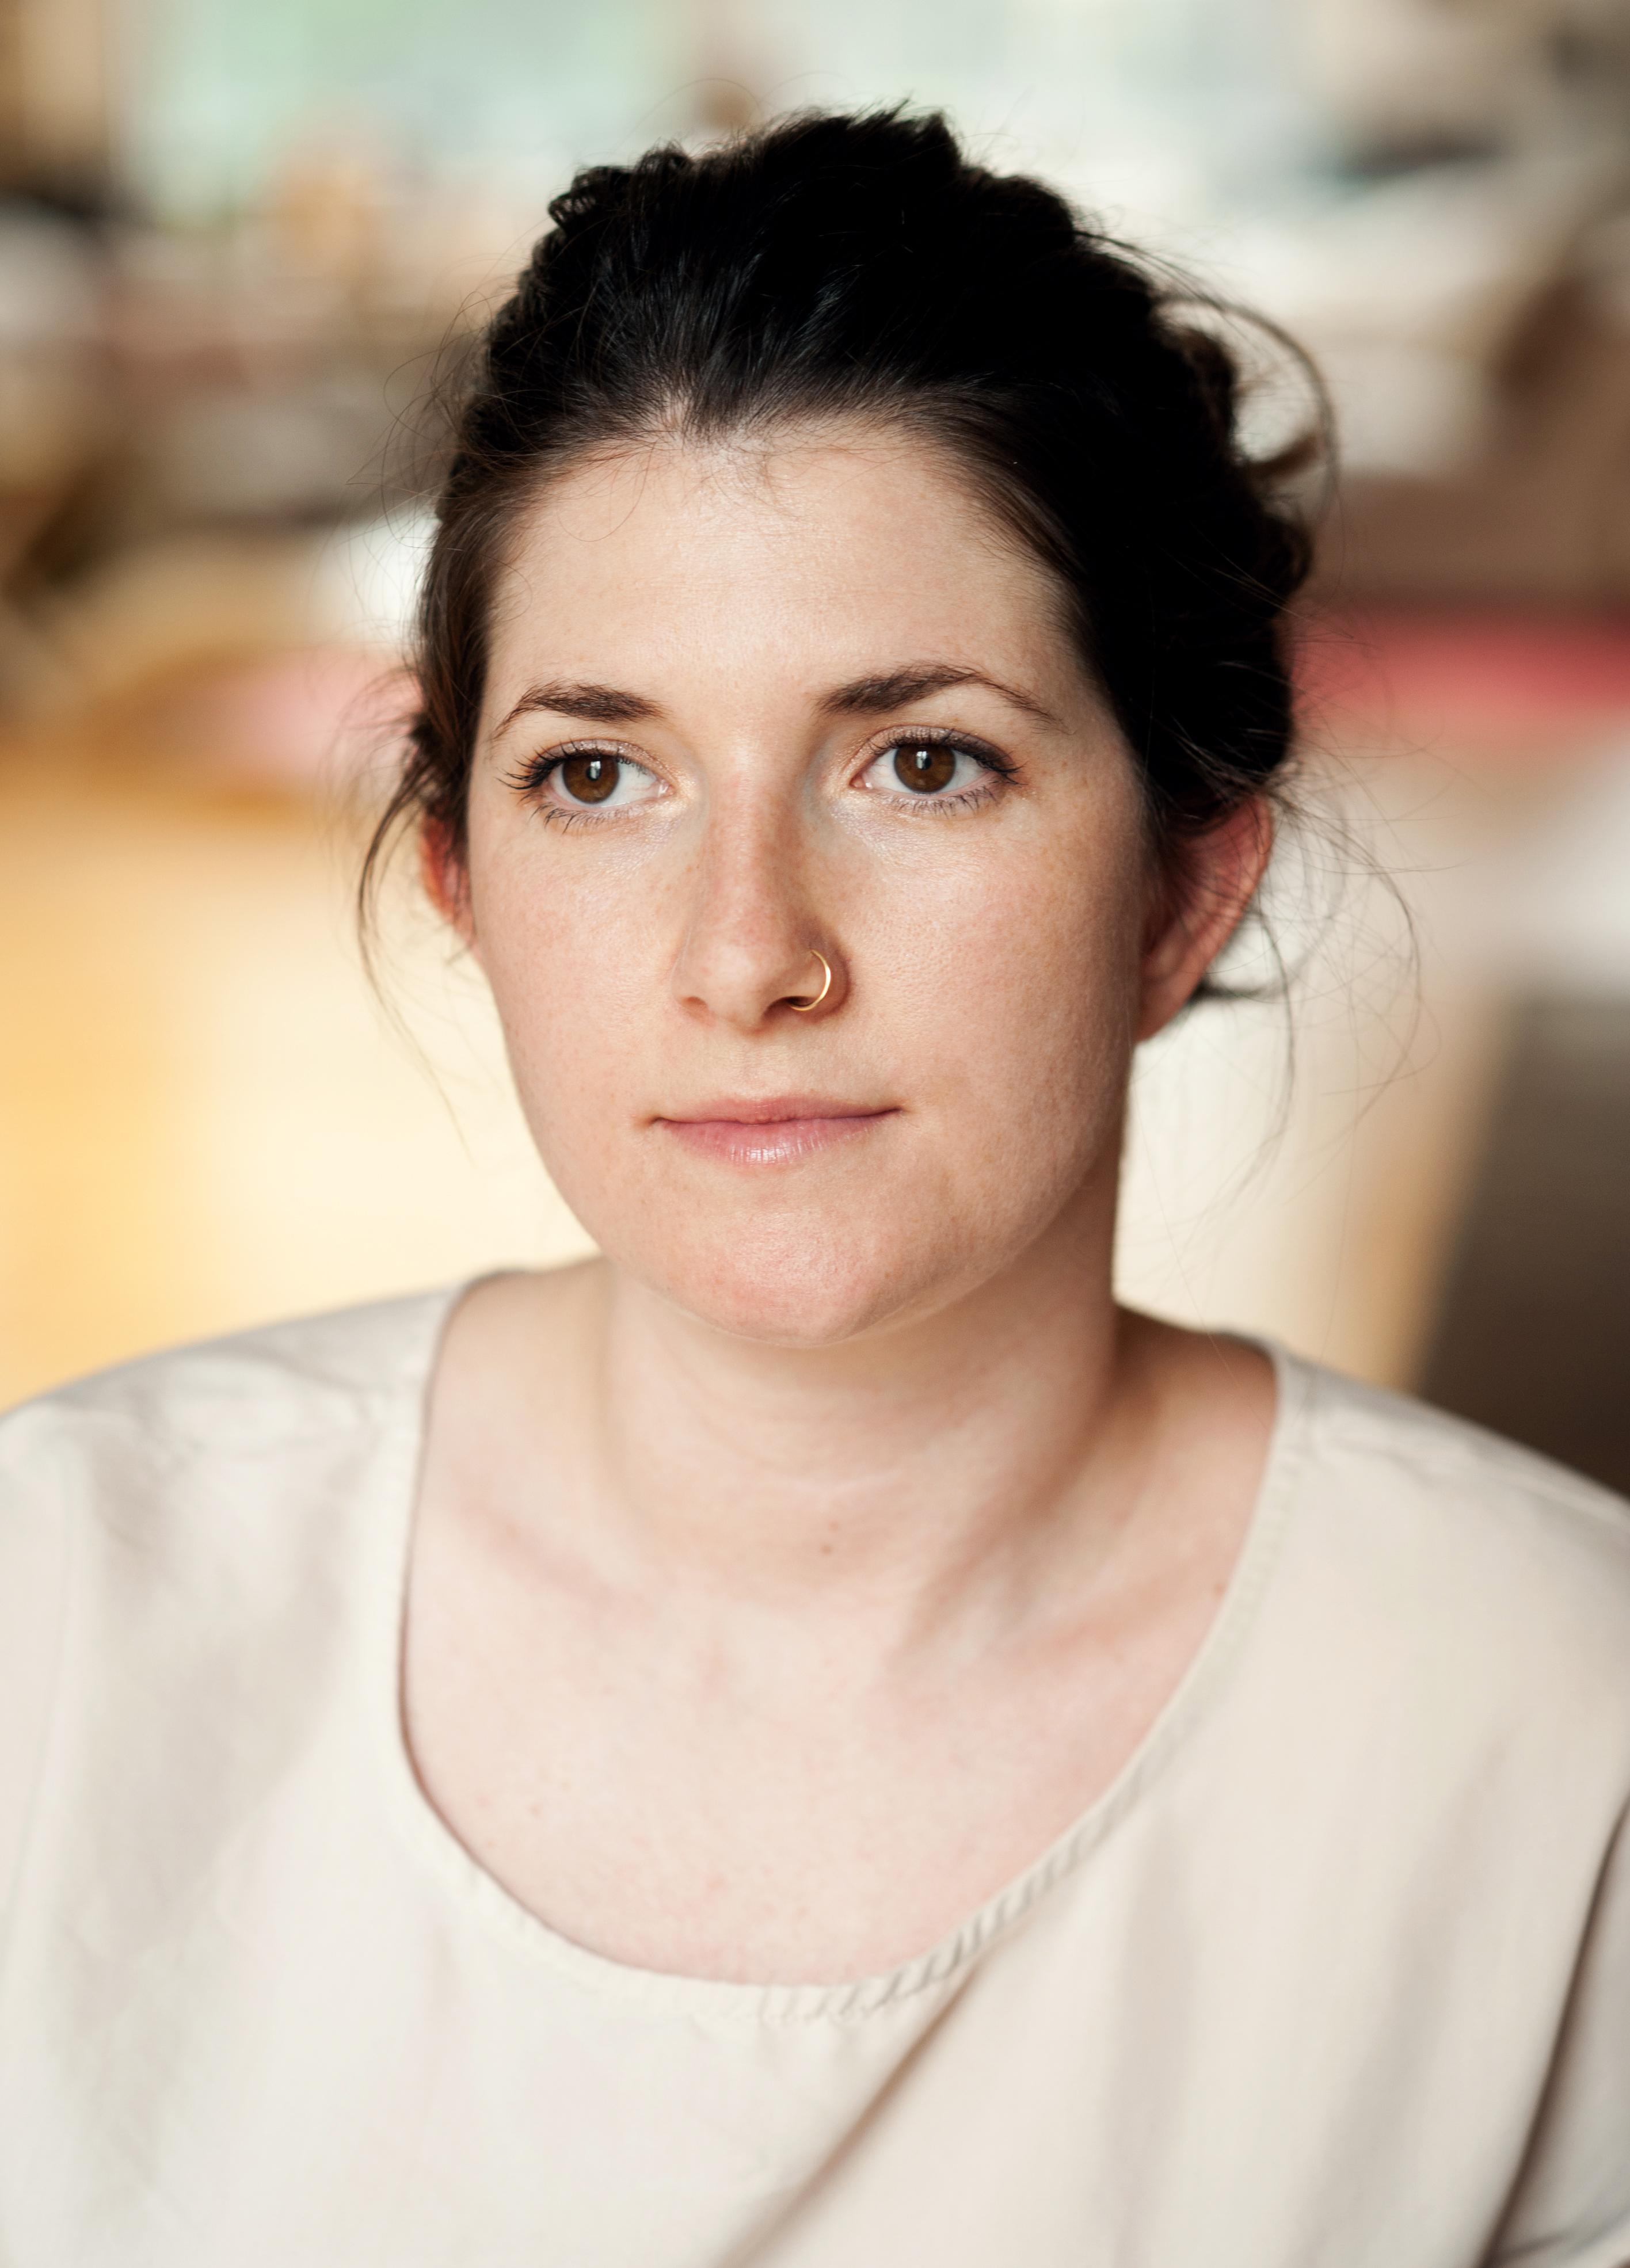 Whom Do You Write For? 'Pandering' Essay Sparks A Conversation